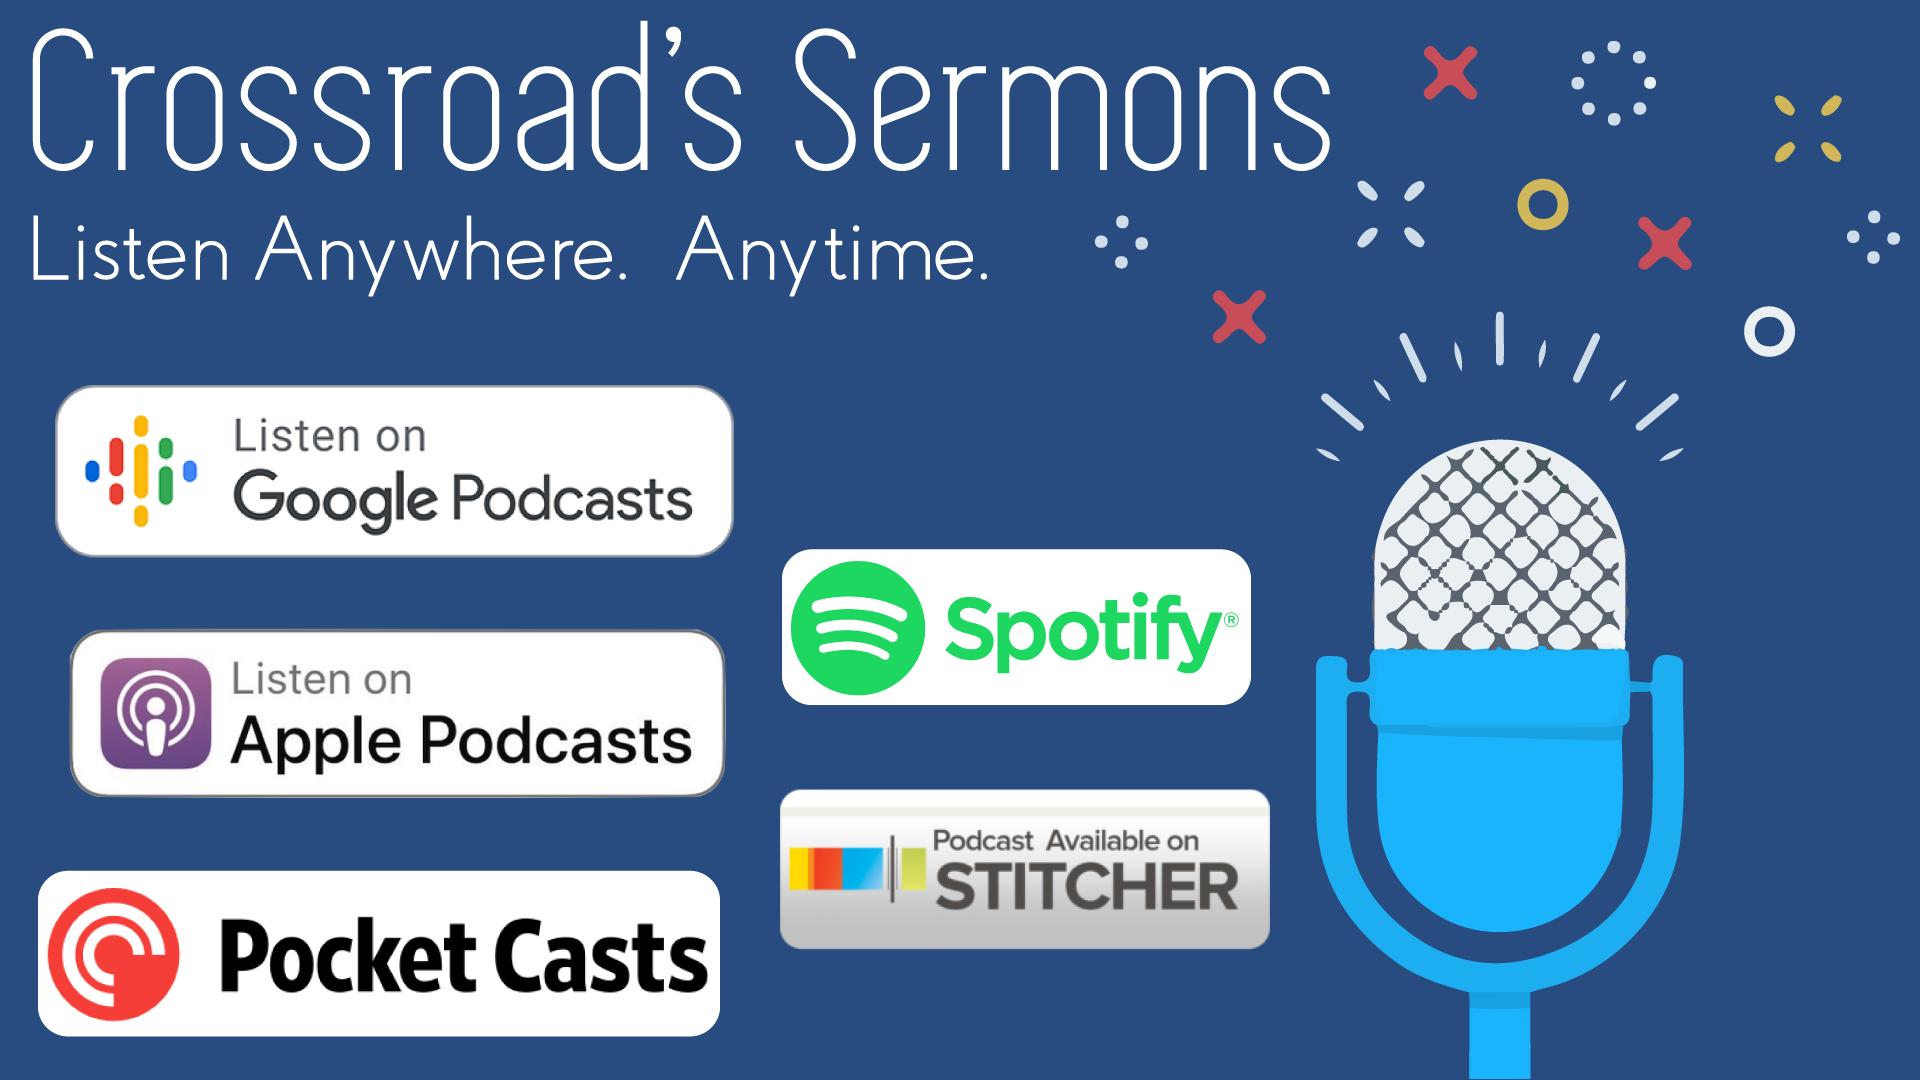 Crossroads-Sermons.png